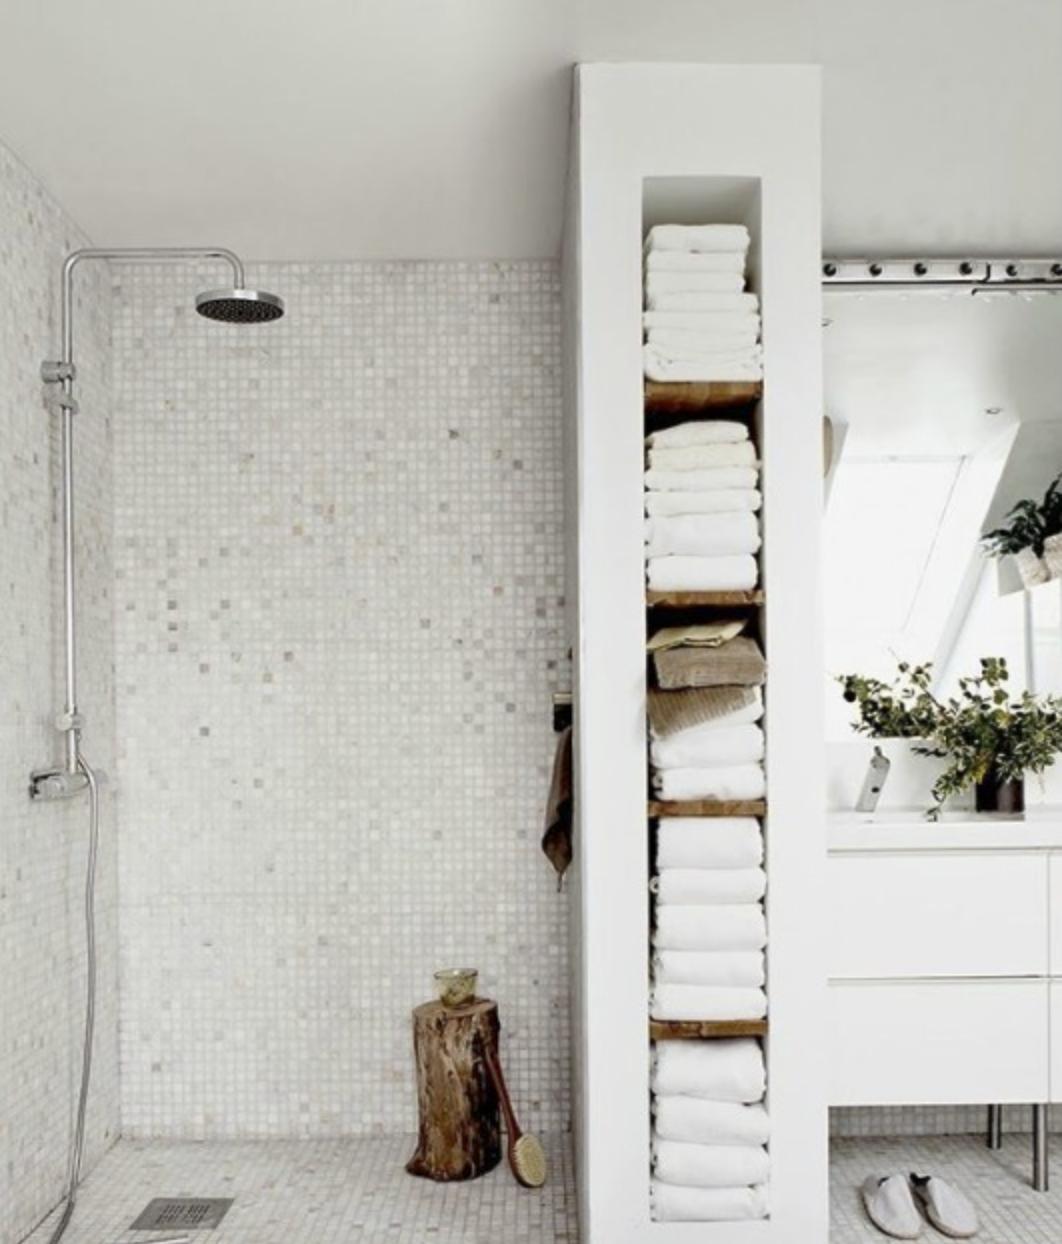 Franciskas vakre verden: 10 gode tips til små bad!